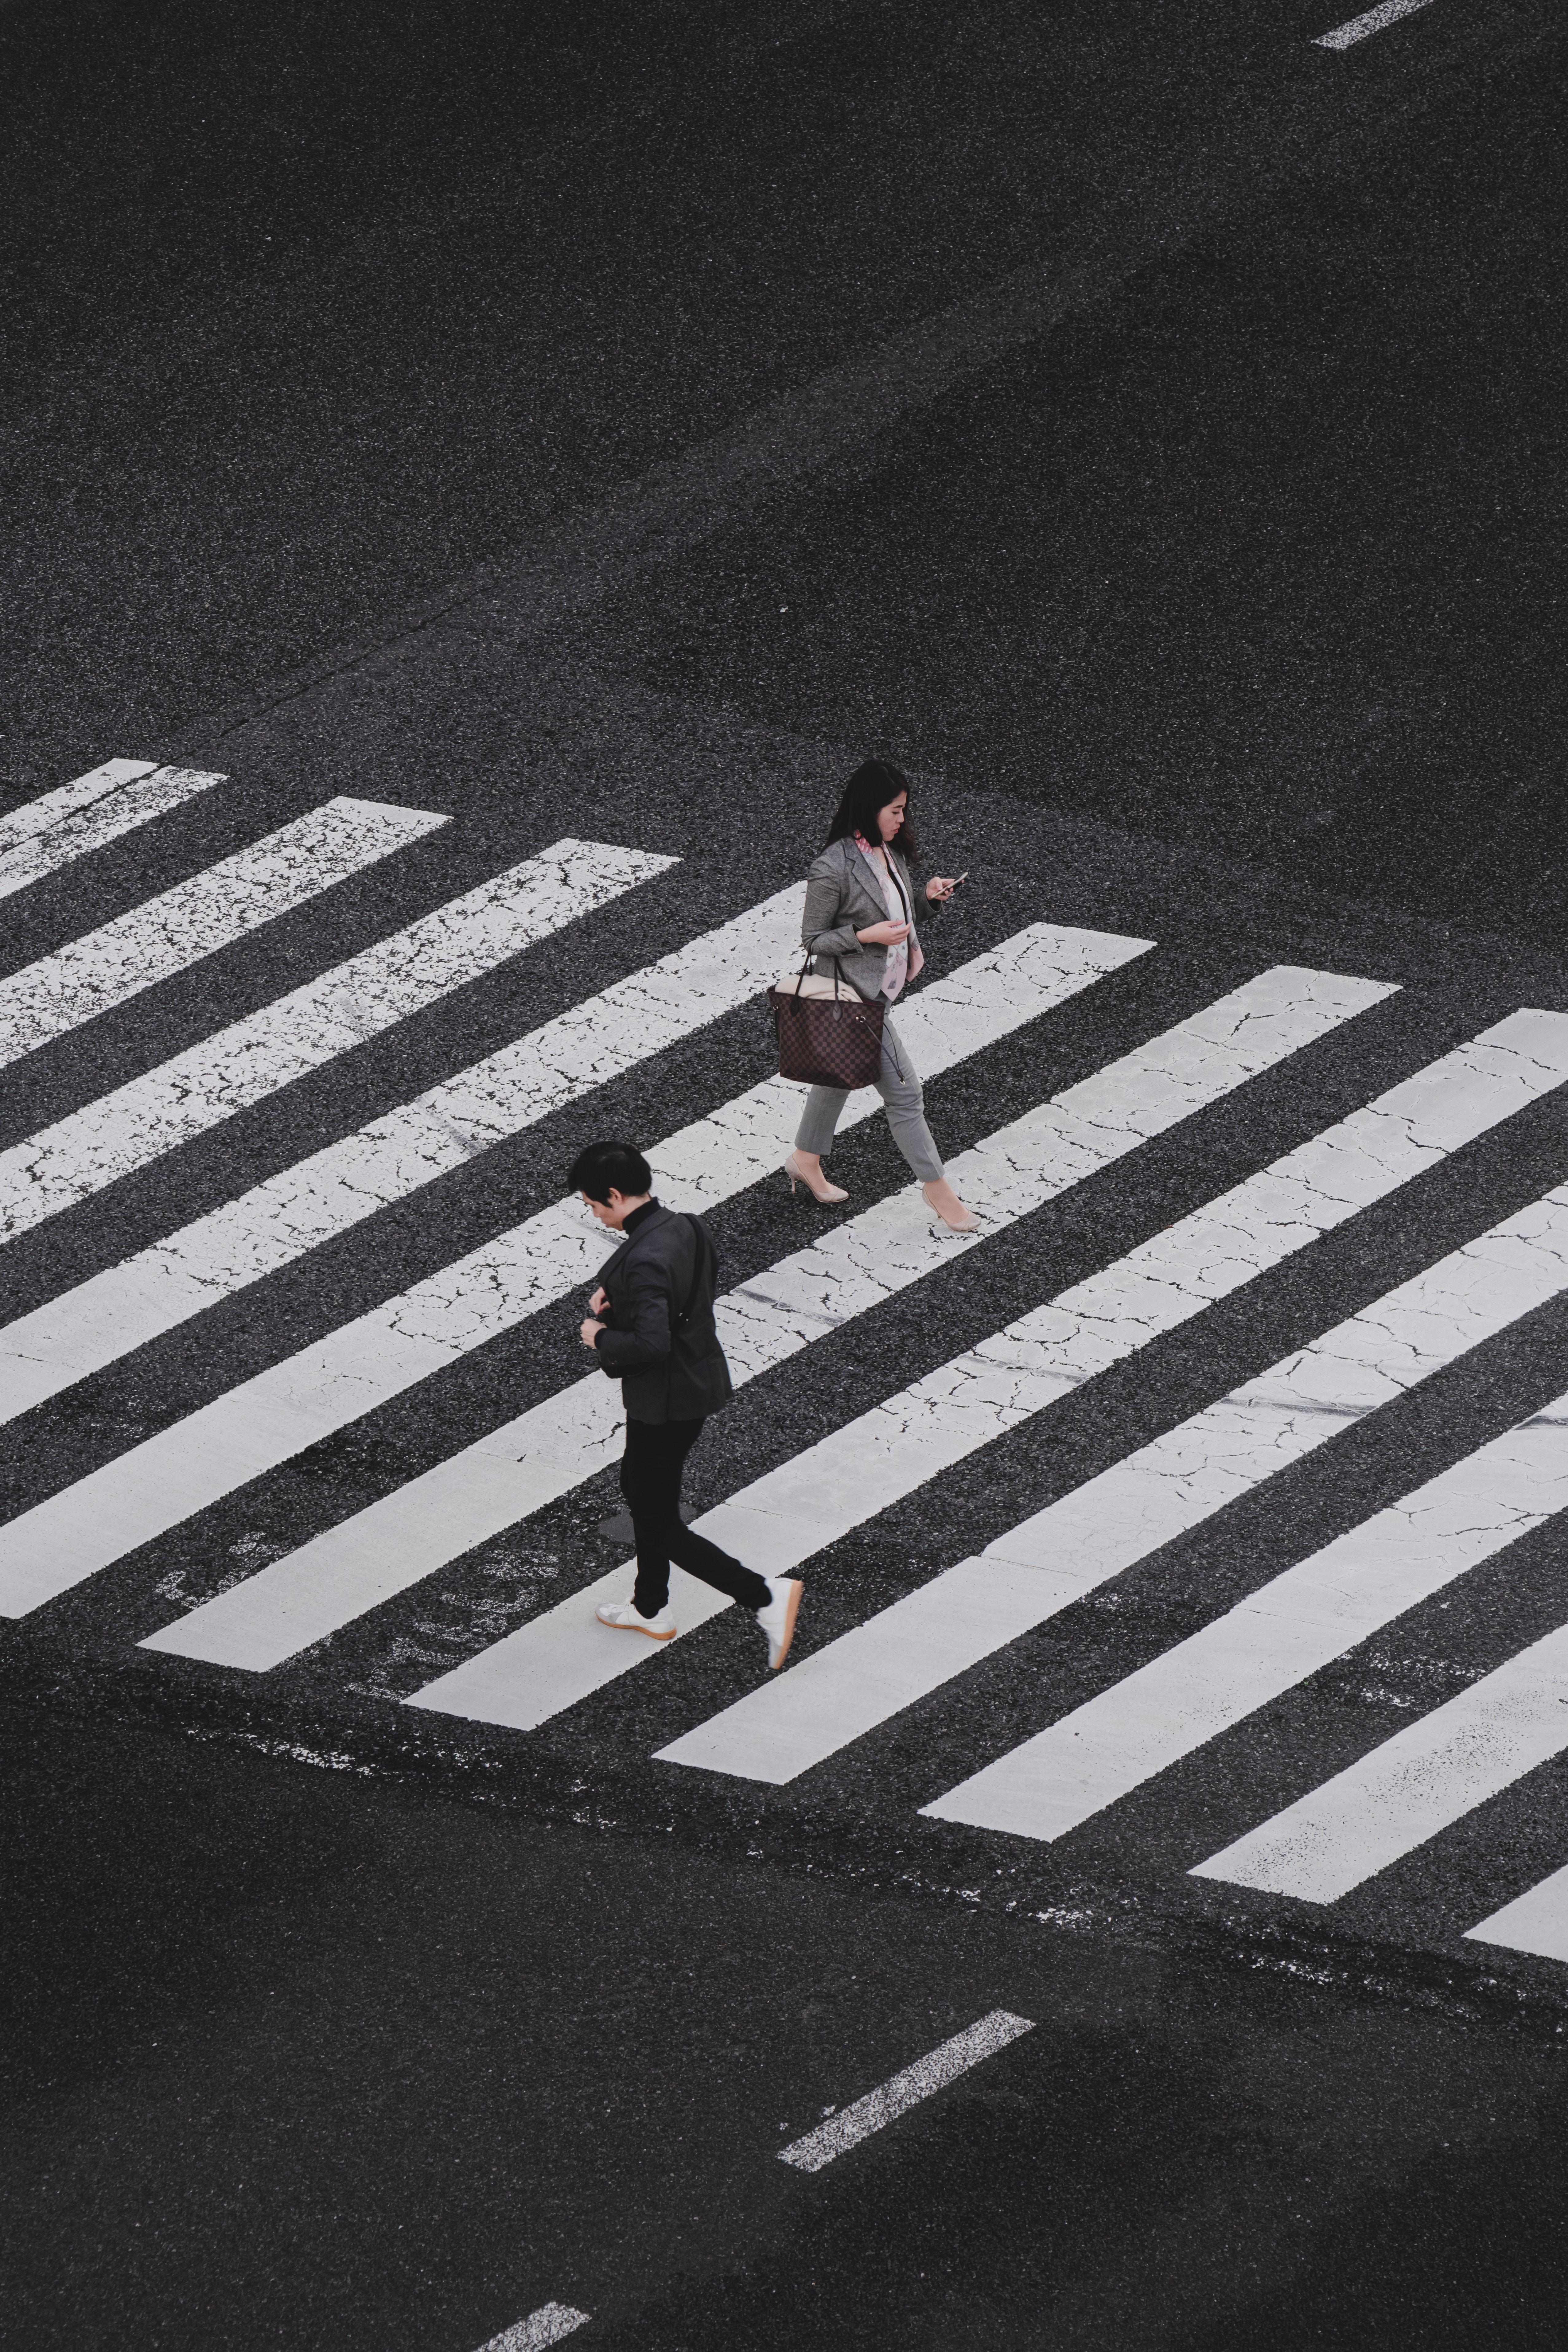 ryoji-iwata-1331938-unsplash